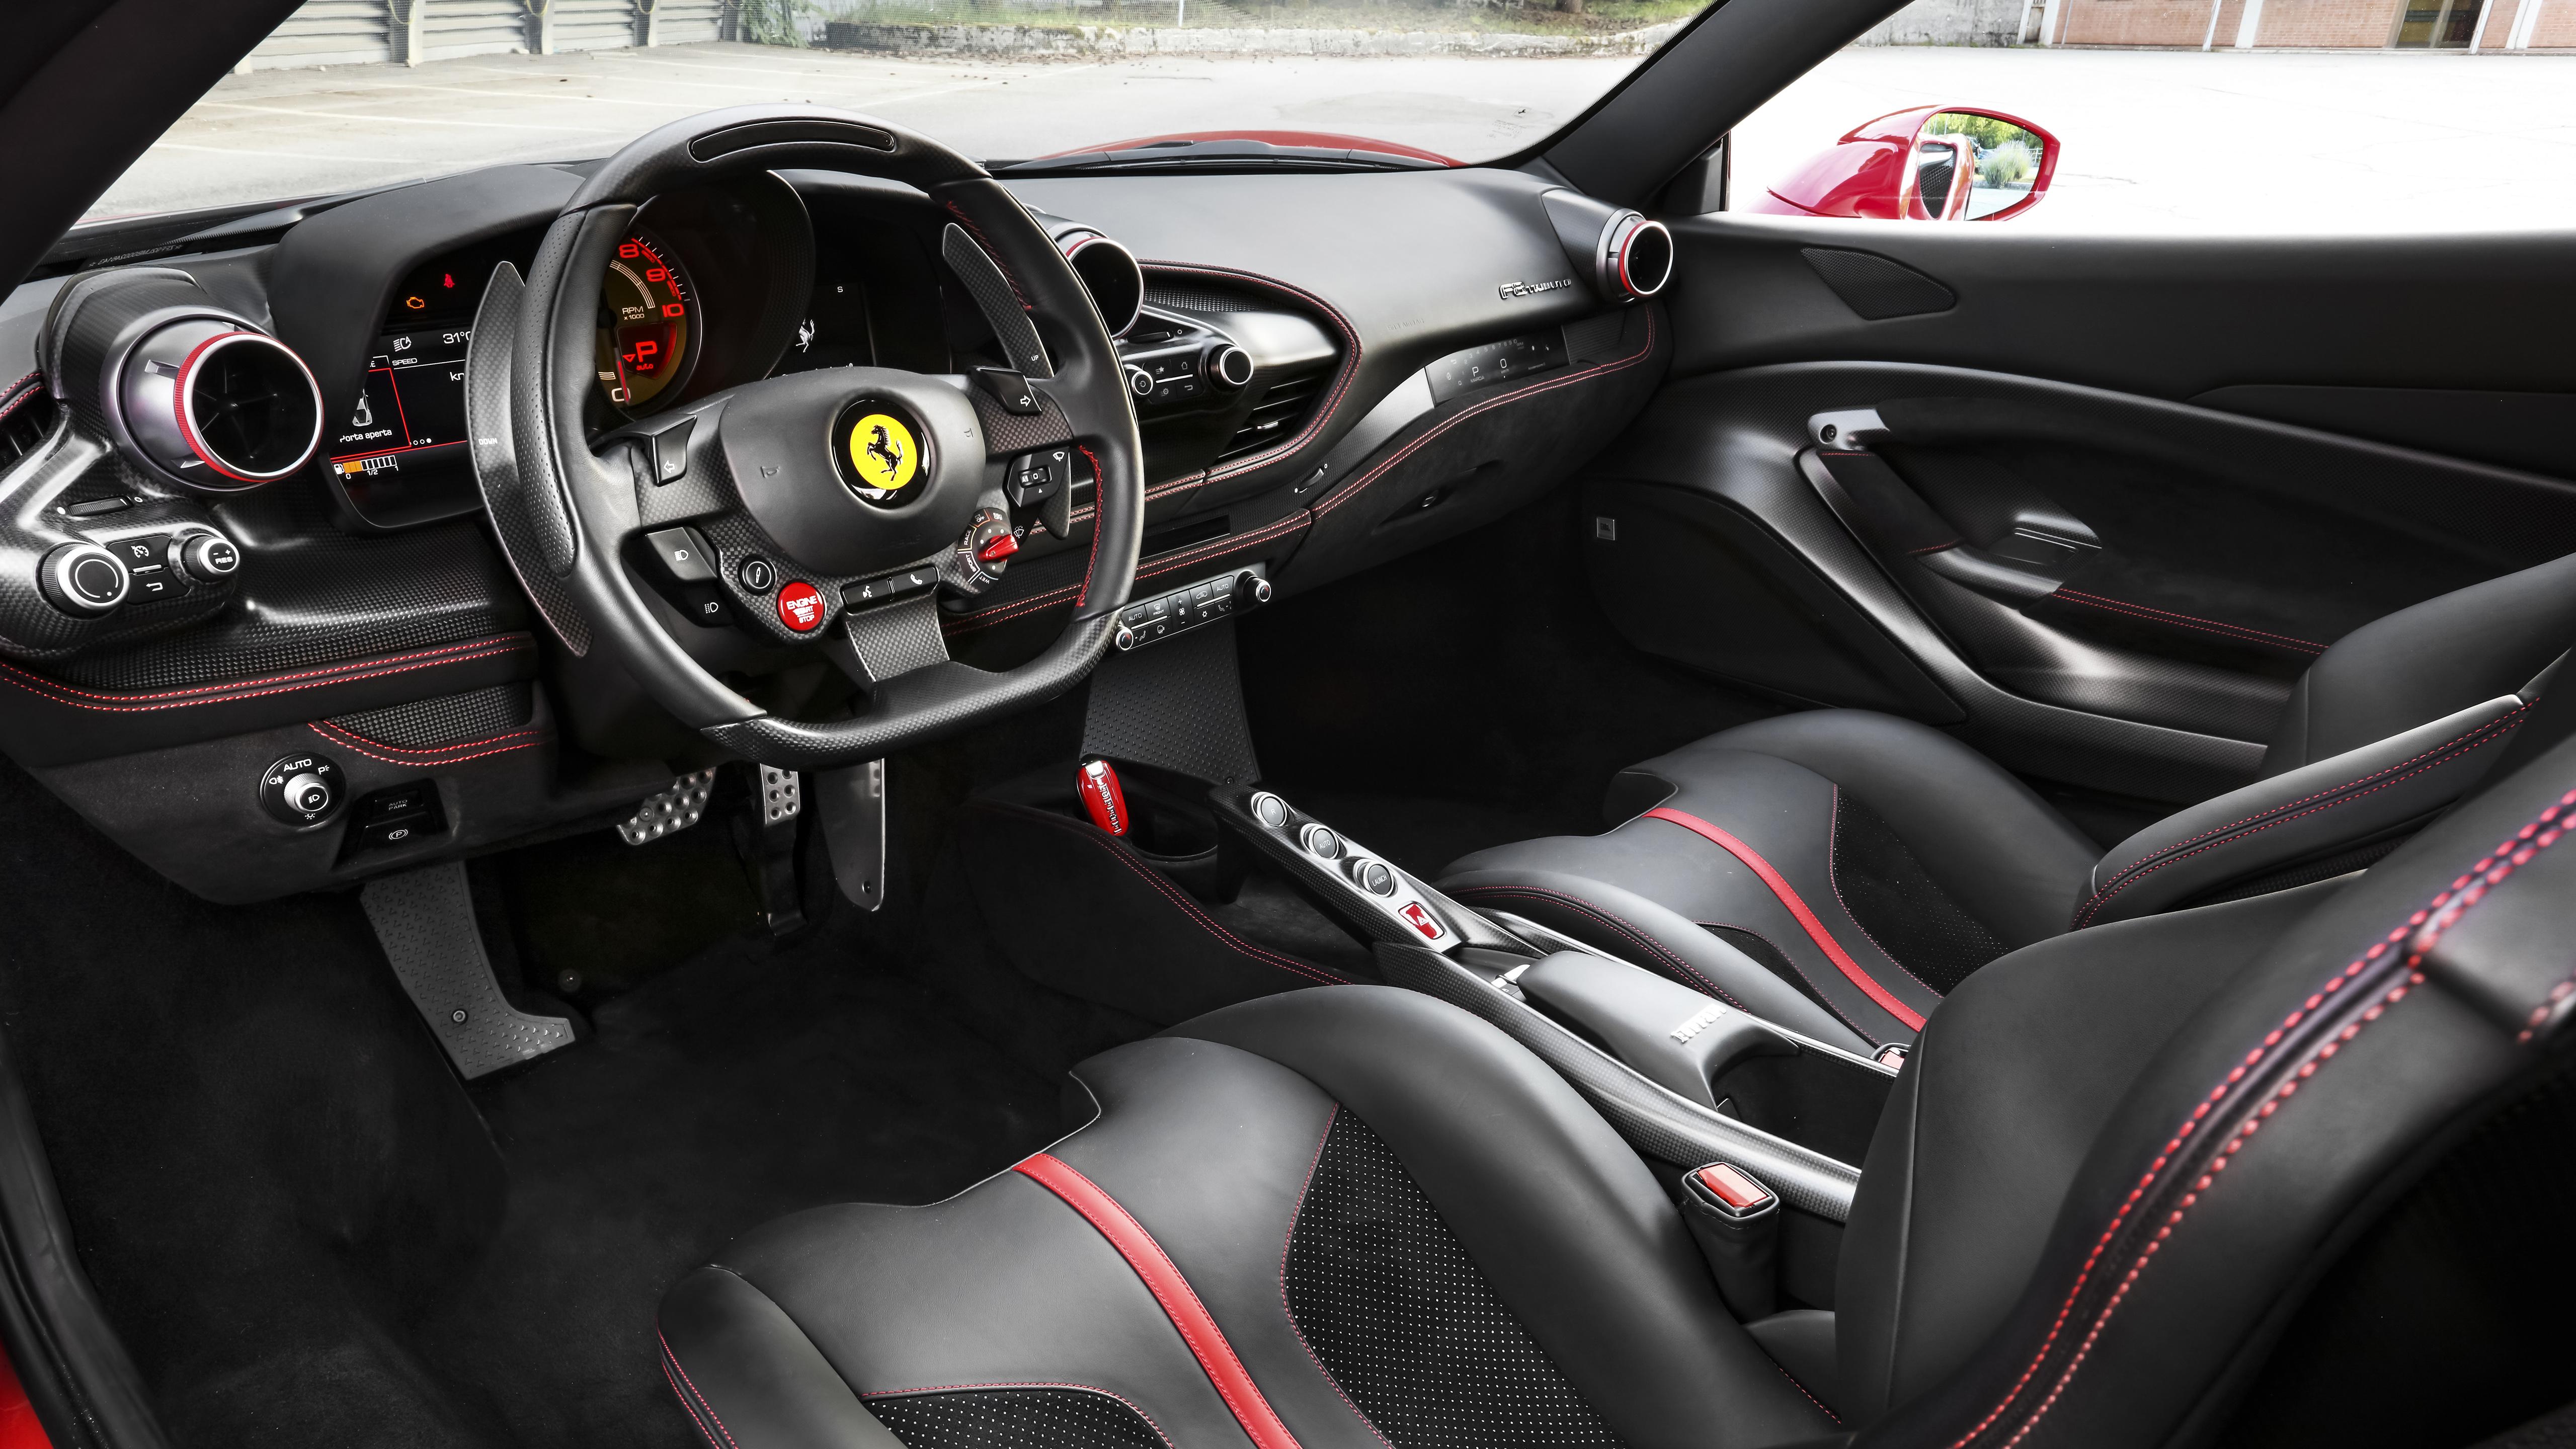 Ferrari F8 Tributo 2019 4k Interior Wallpaper Hd Car